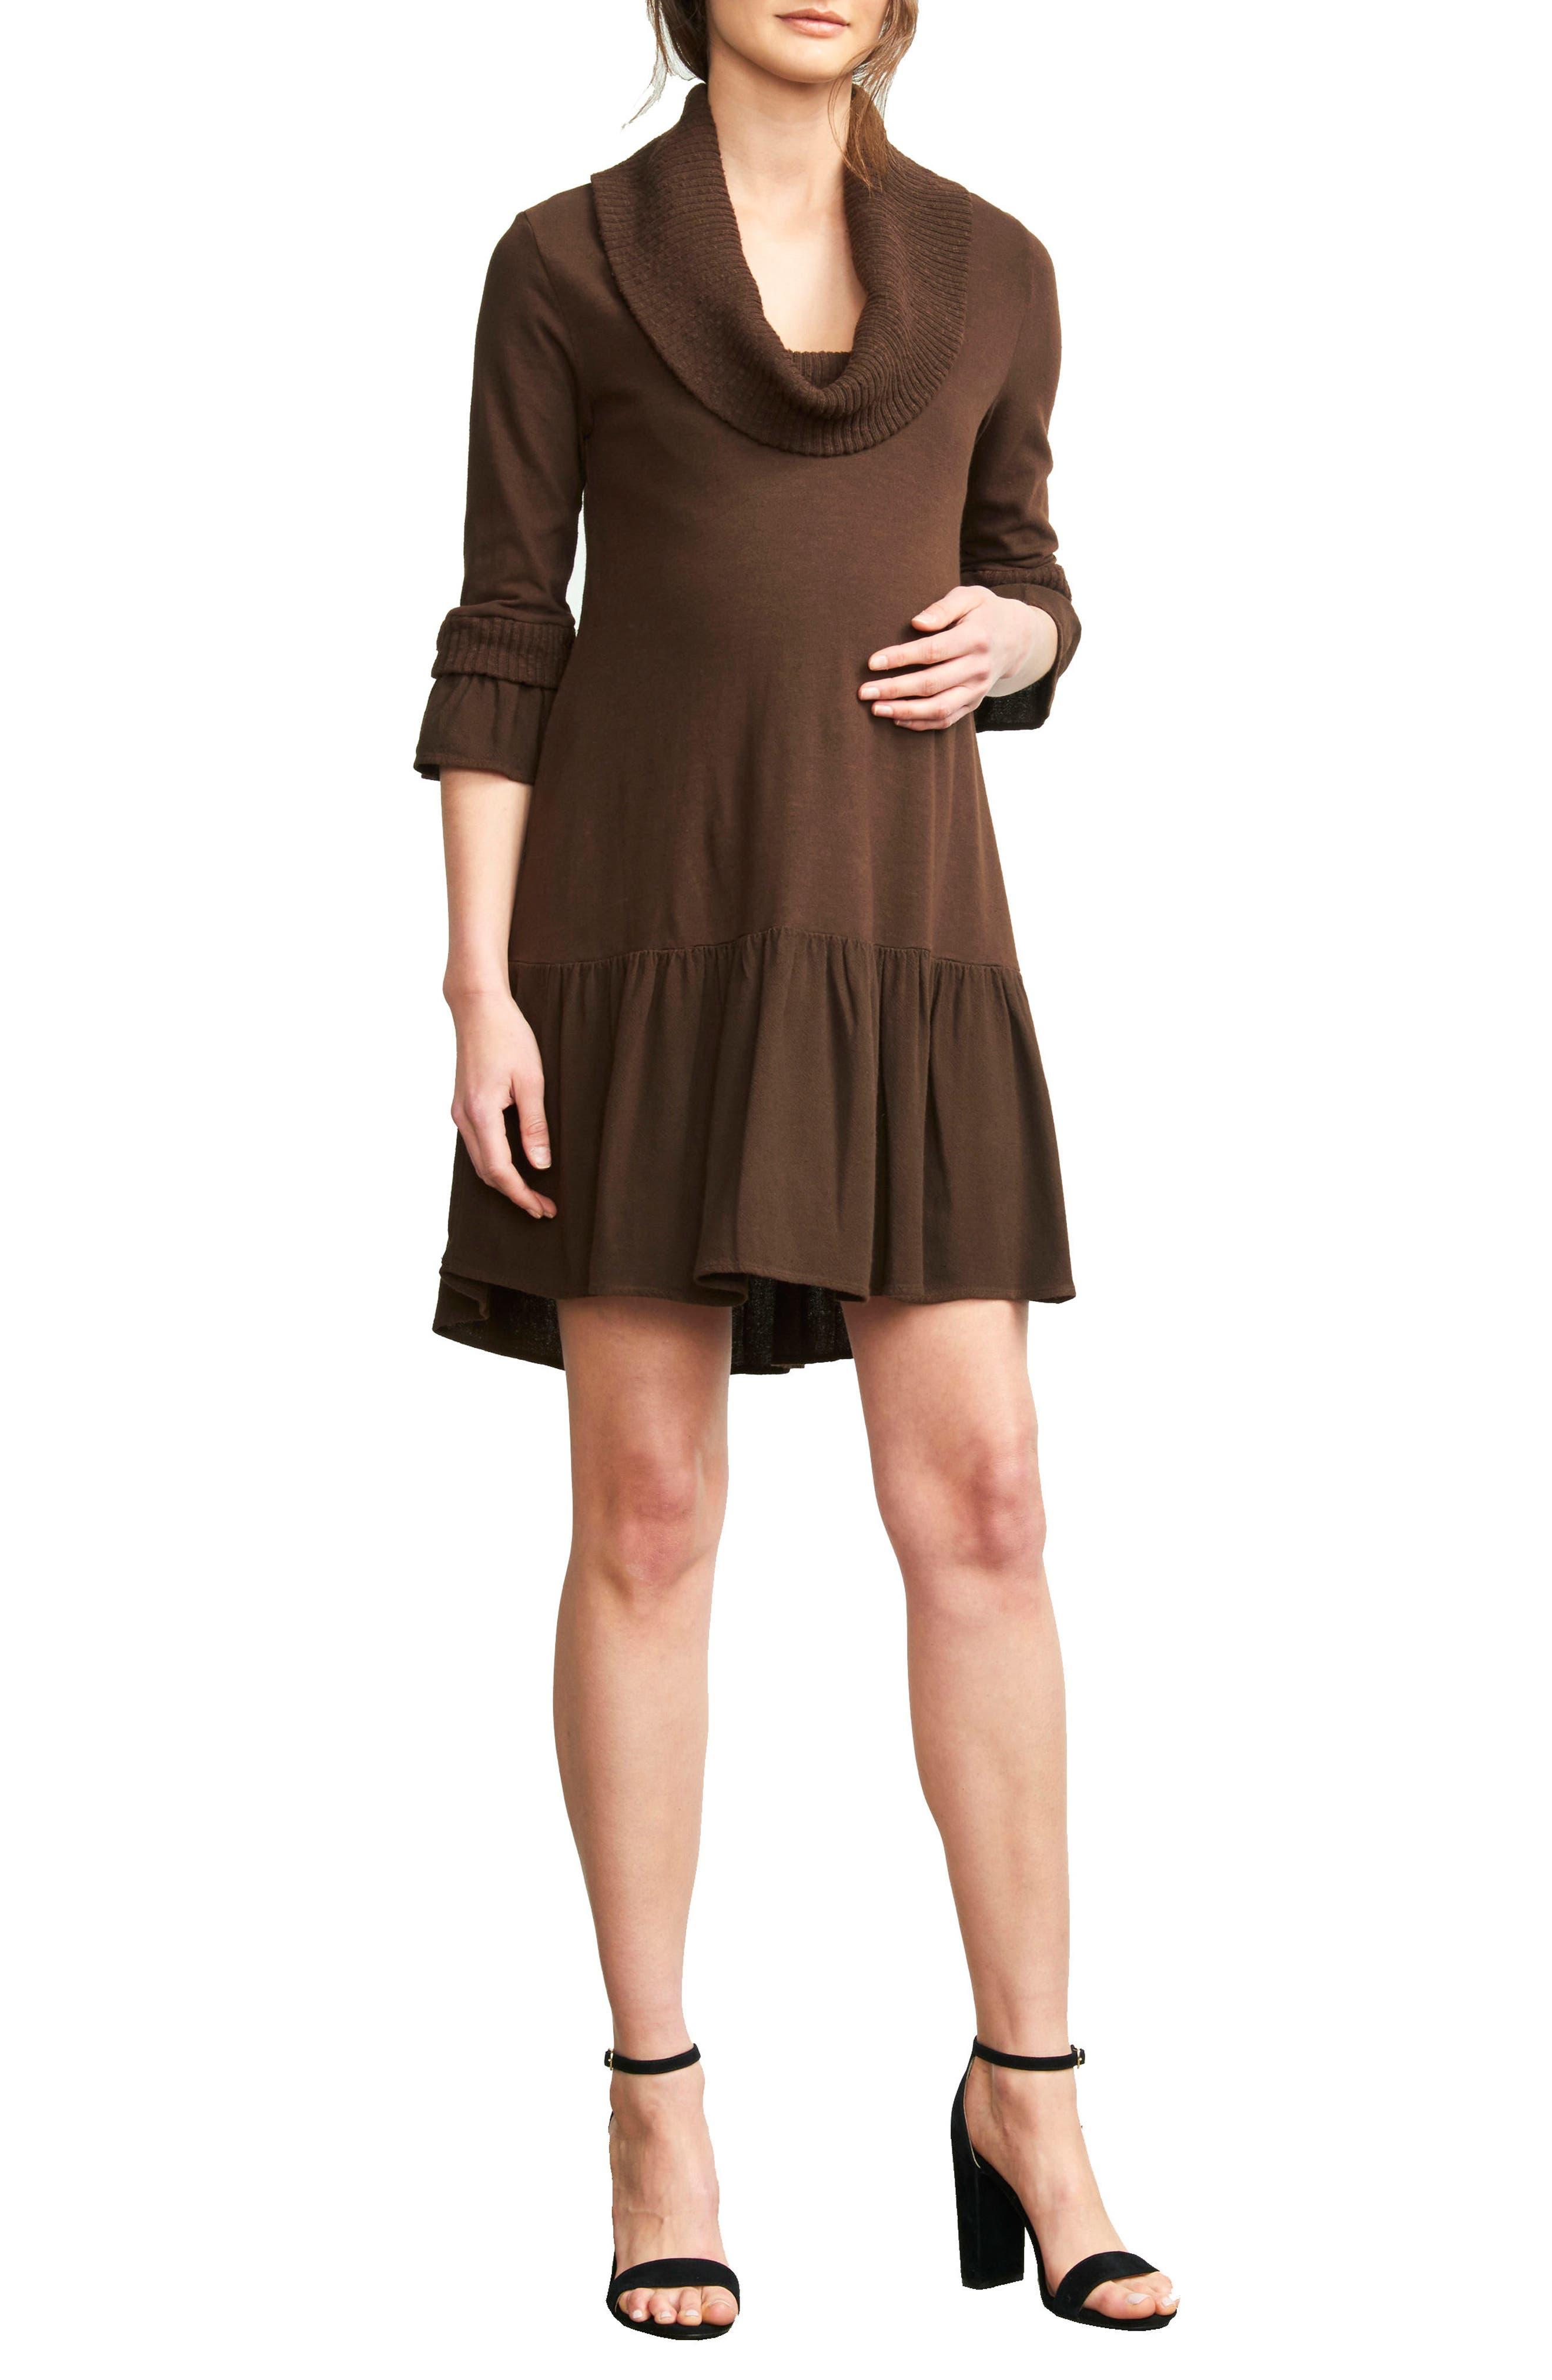 MATERNAL AMERICA, Cowl Neck Maternity Dress, Main thumbnail 1, color, CHOCOLATE